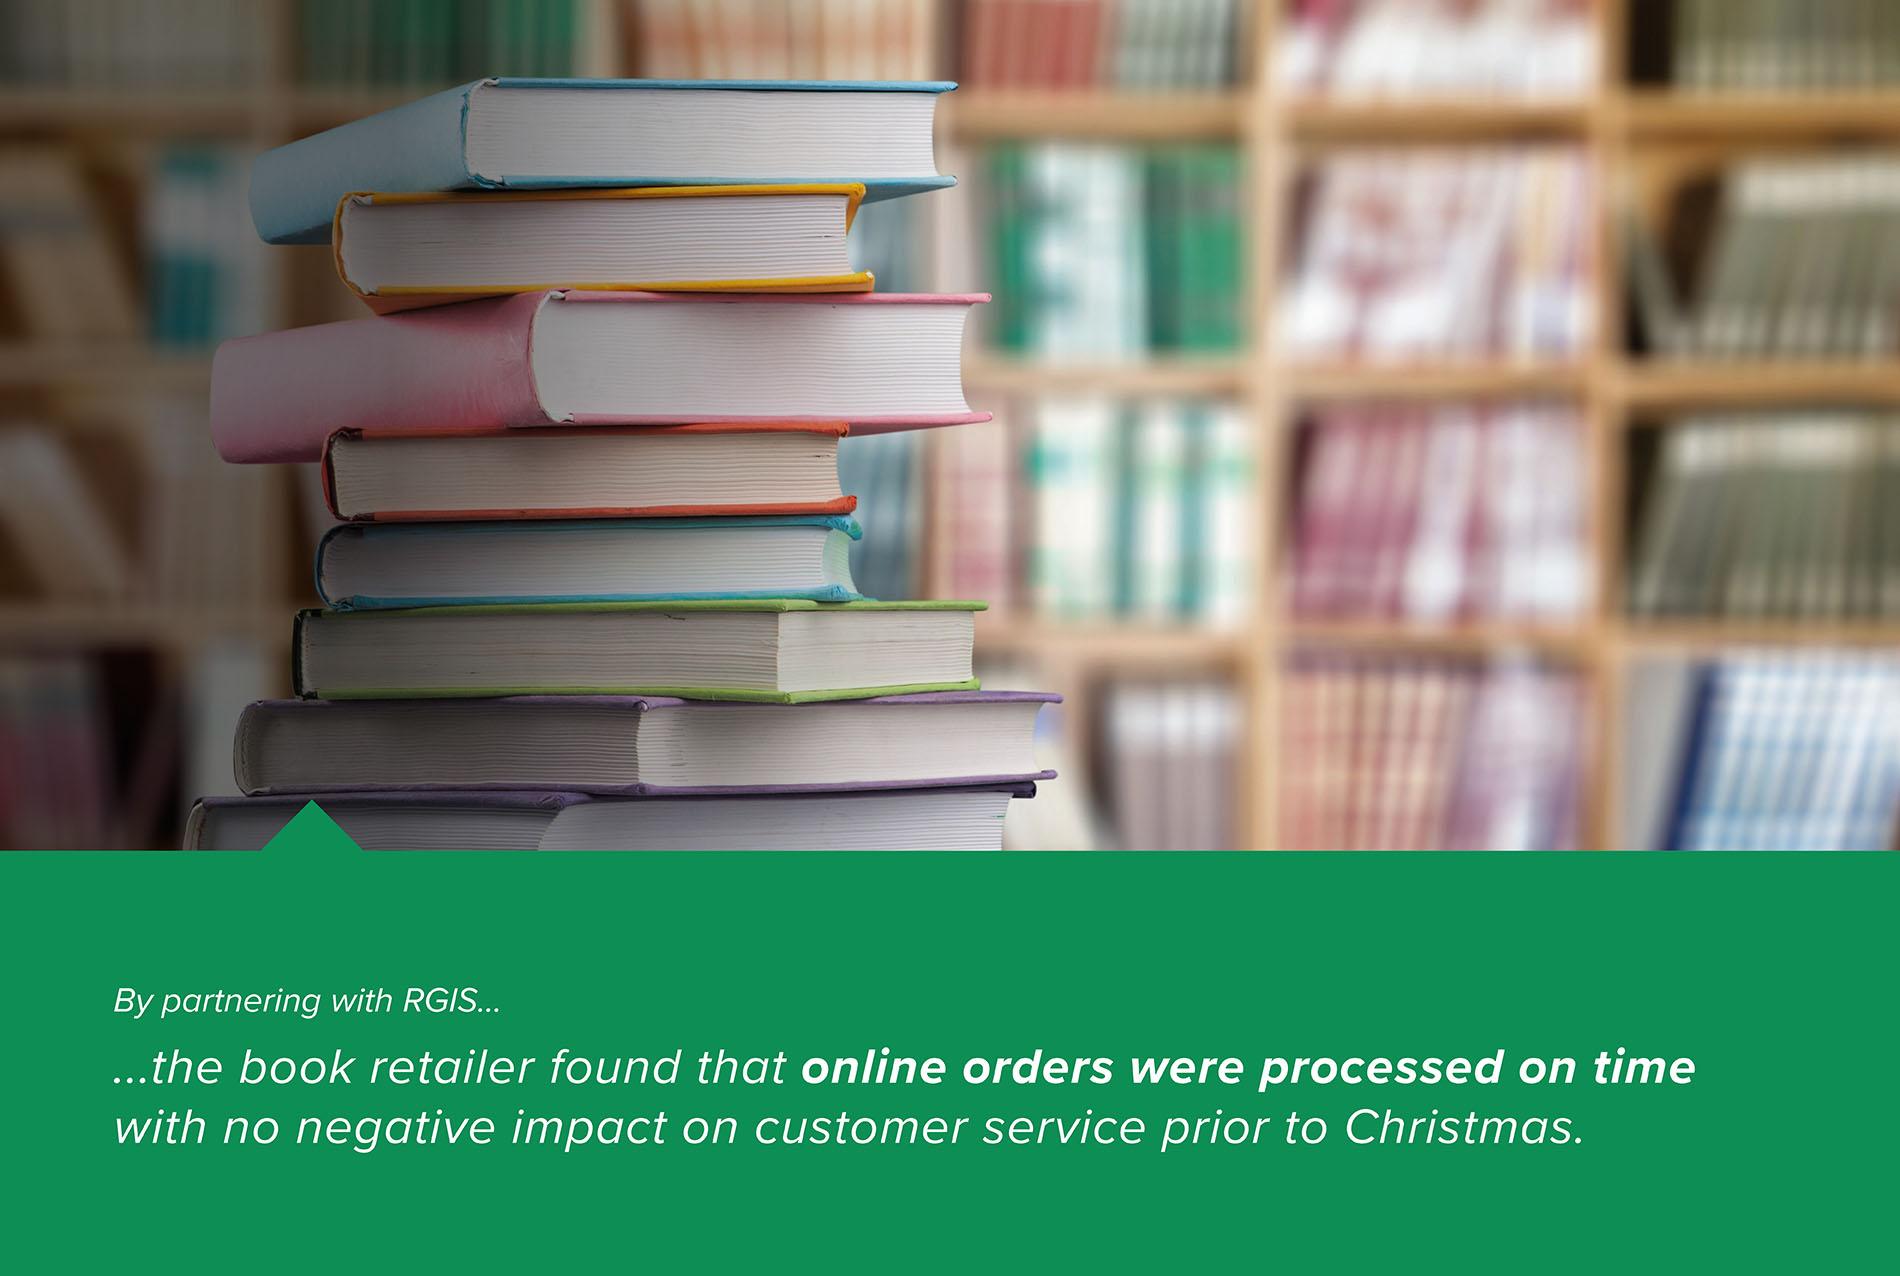 Staff Support to Reduce Online Order Backlog